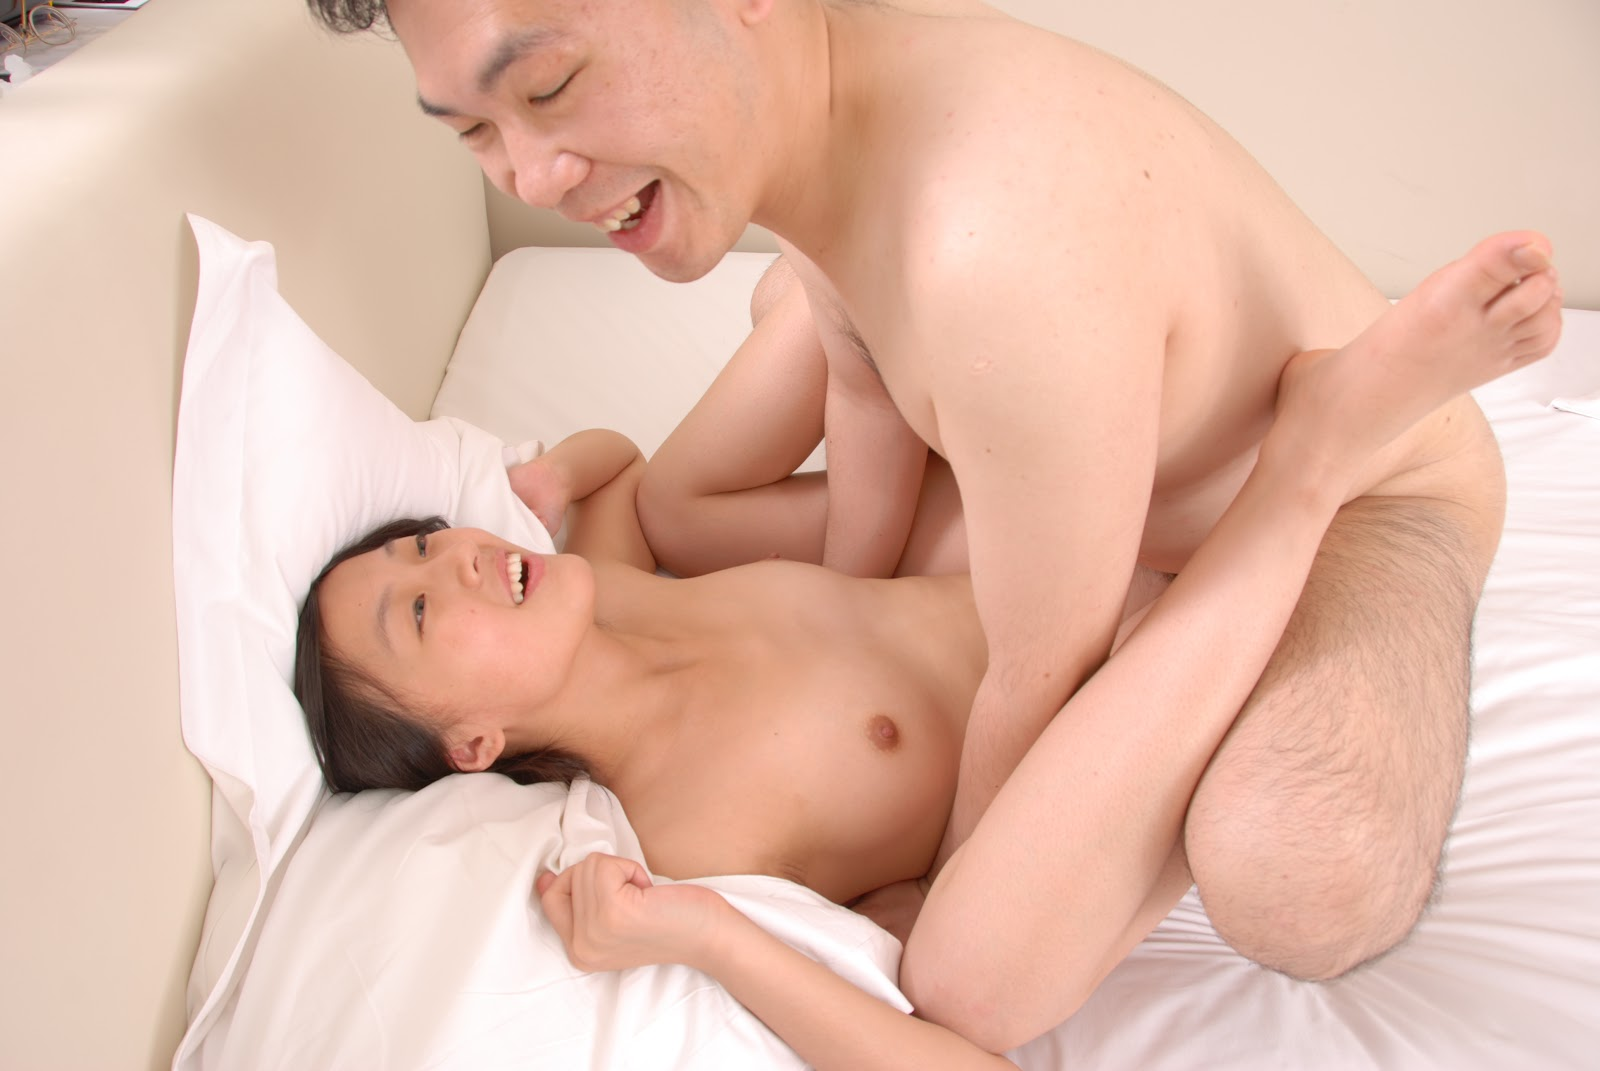 Peliculas Porno De Mirie Mooror chubby bitches strip in a club showing off their boobs best